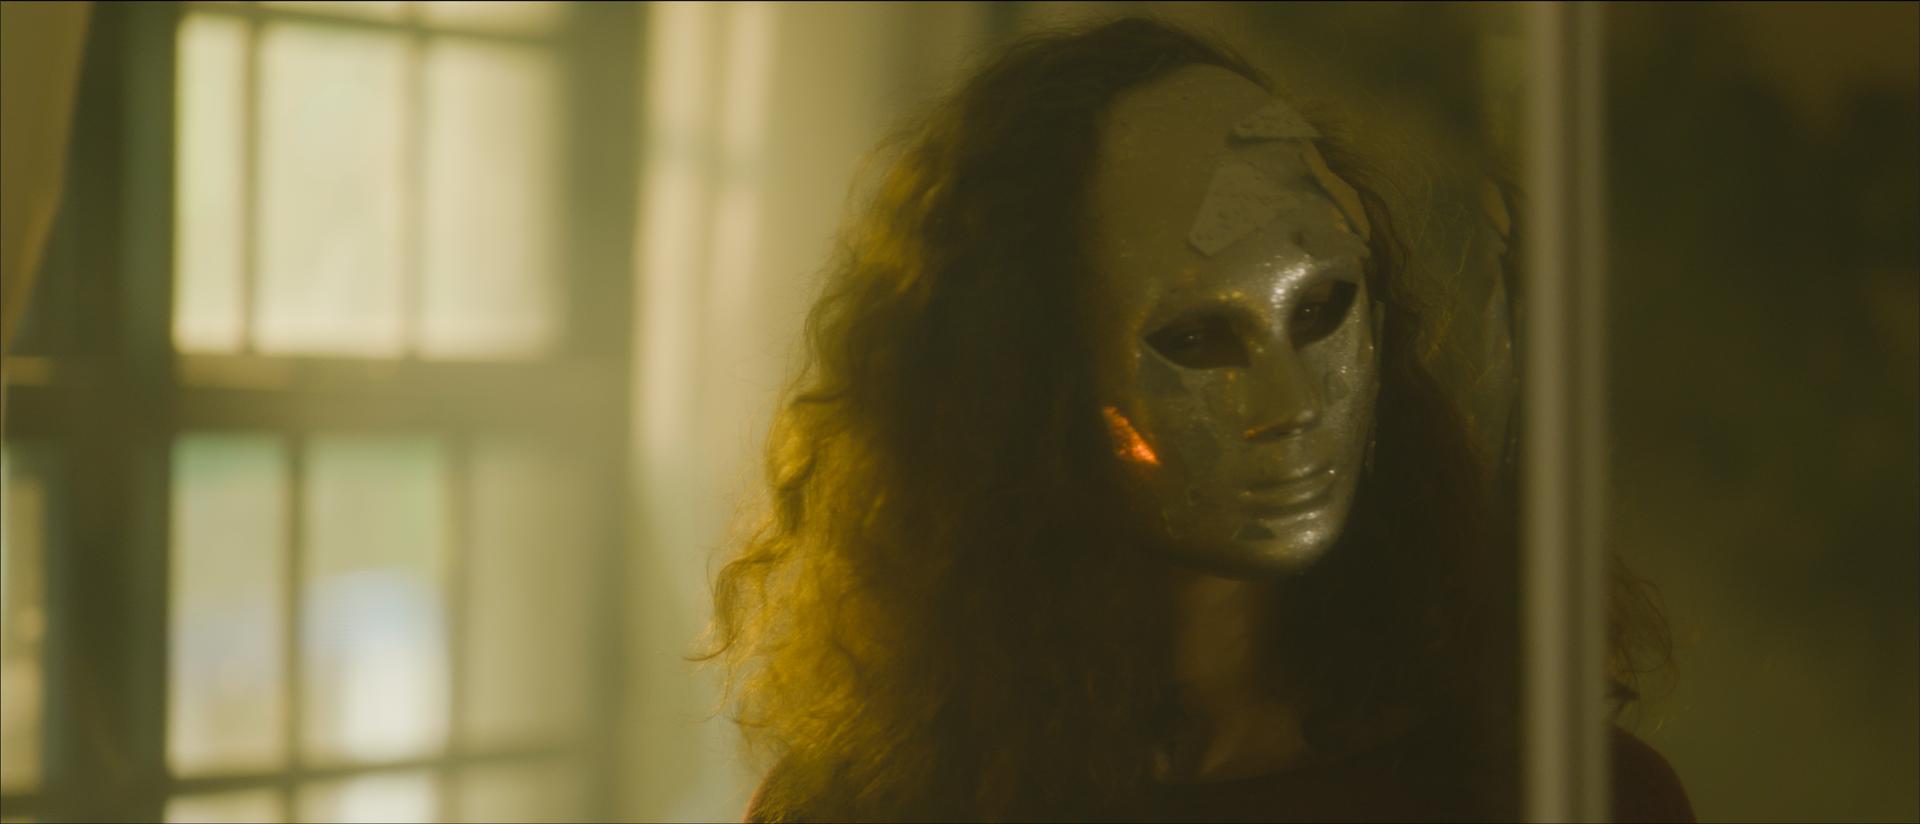 Masked Figure - Mask 1 CU